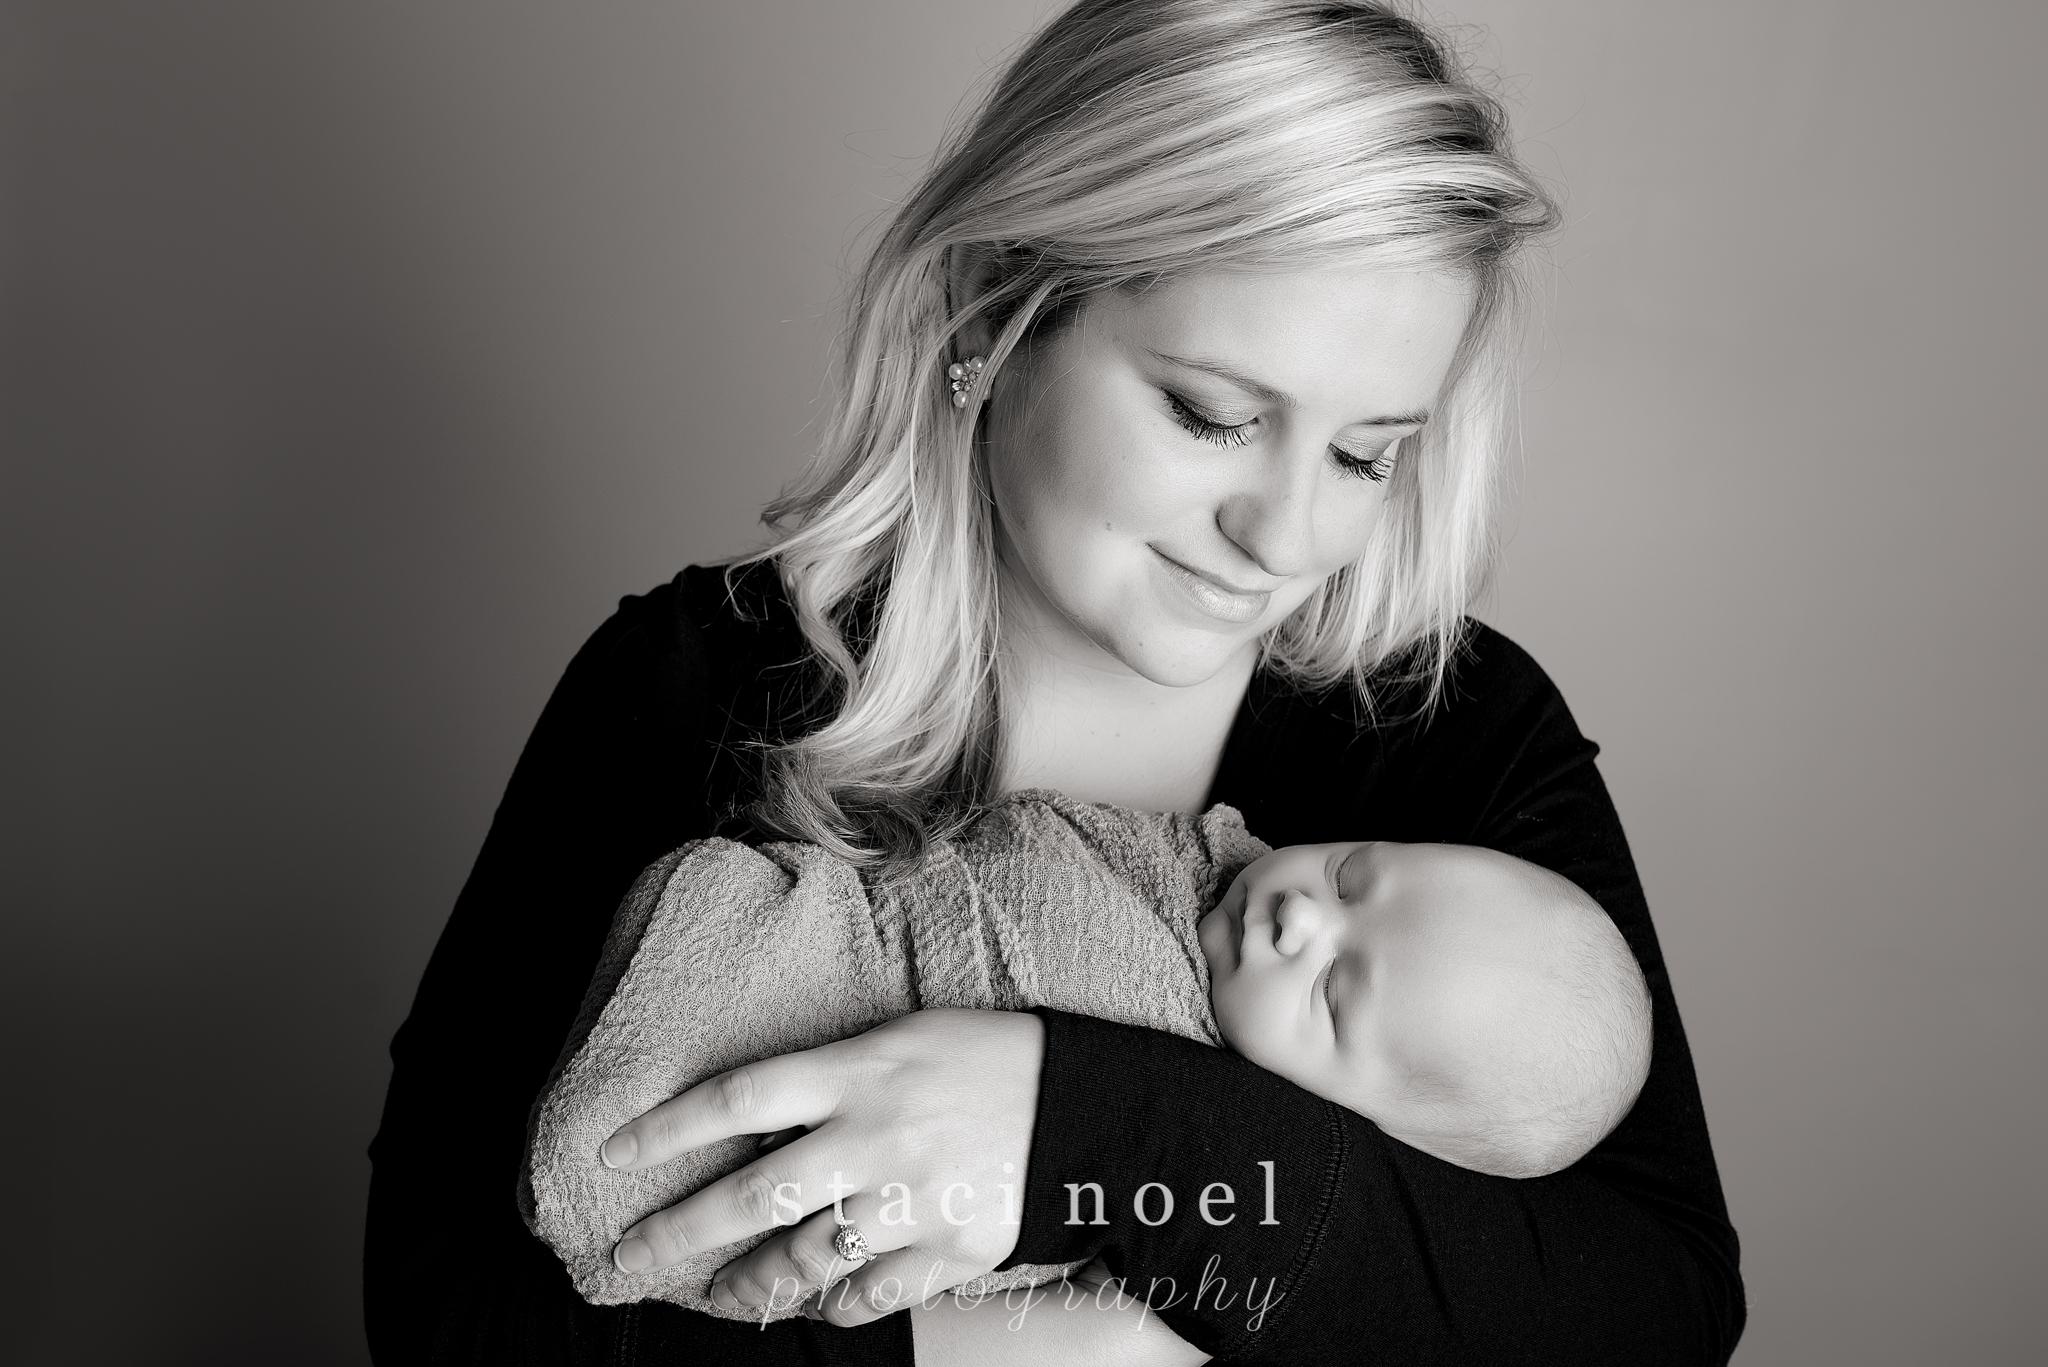 staci.noel.photography.newborn.boy.charlotte.nc1.jpg